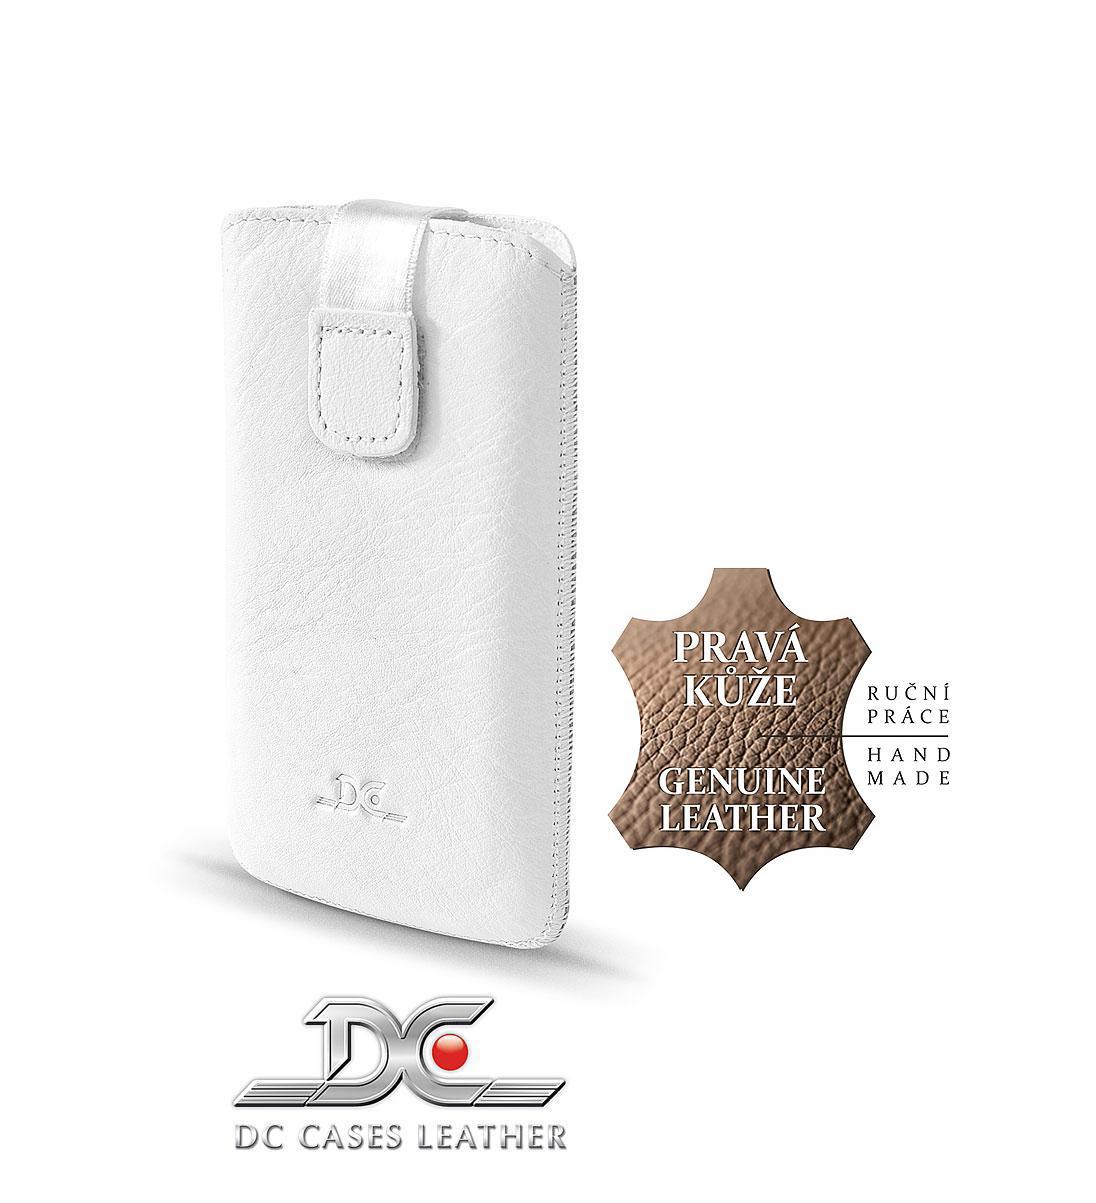 DC (TOP) POUZDRO L T15 Protect Montone BÍLÉ (N97, IPHONE 4G, HTC DESIRE ..)